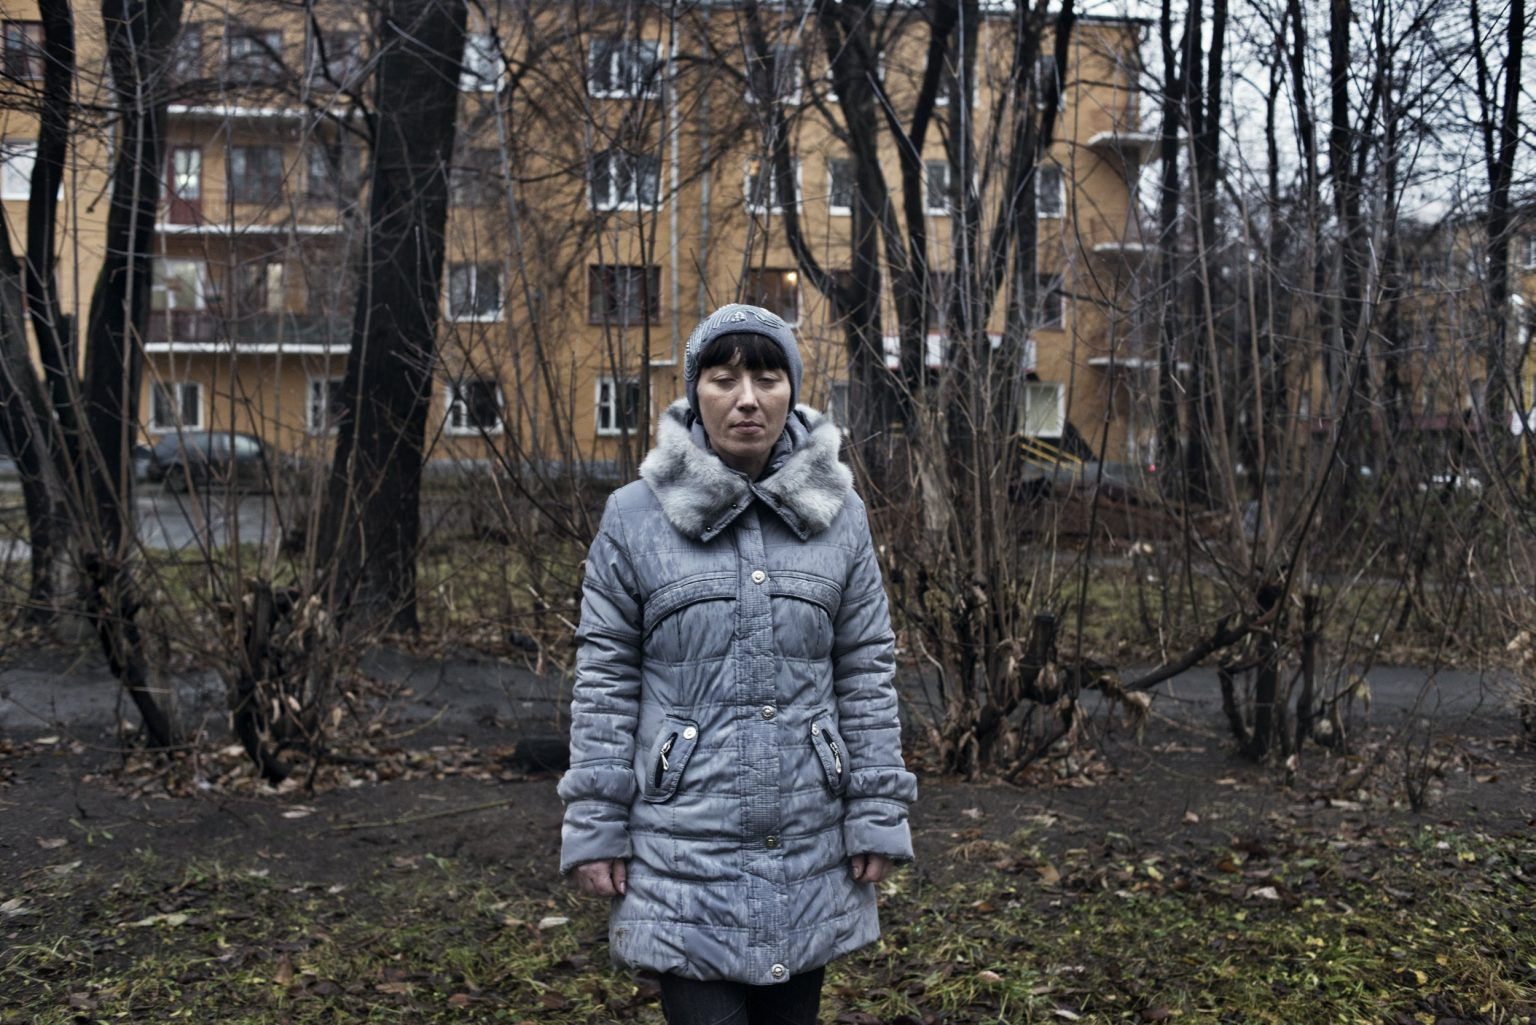 Yekaterinburg, Russia, November 2013  - Zhanna under the effect of Krokodil, in a street in Yekaterinburg. (She died in 2015 due to the long use of Krokodil). >< Yekaterinburg, Russia, novembre 2013 - Zhanna sotto l'effetto della Krokodil in una strada di Yekaterinburg. (Zhanna è morta nel 2015 a seguito dell'uso prolungato di Krokdoil).